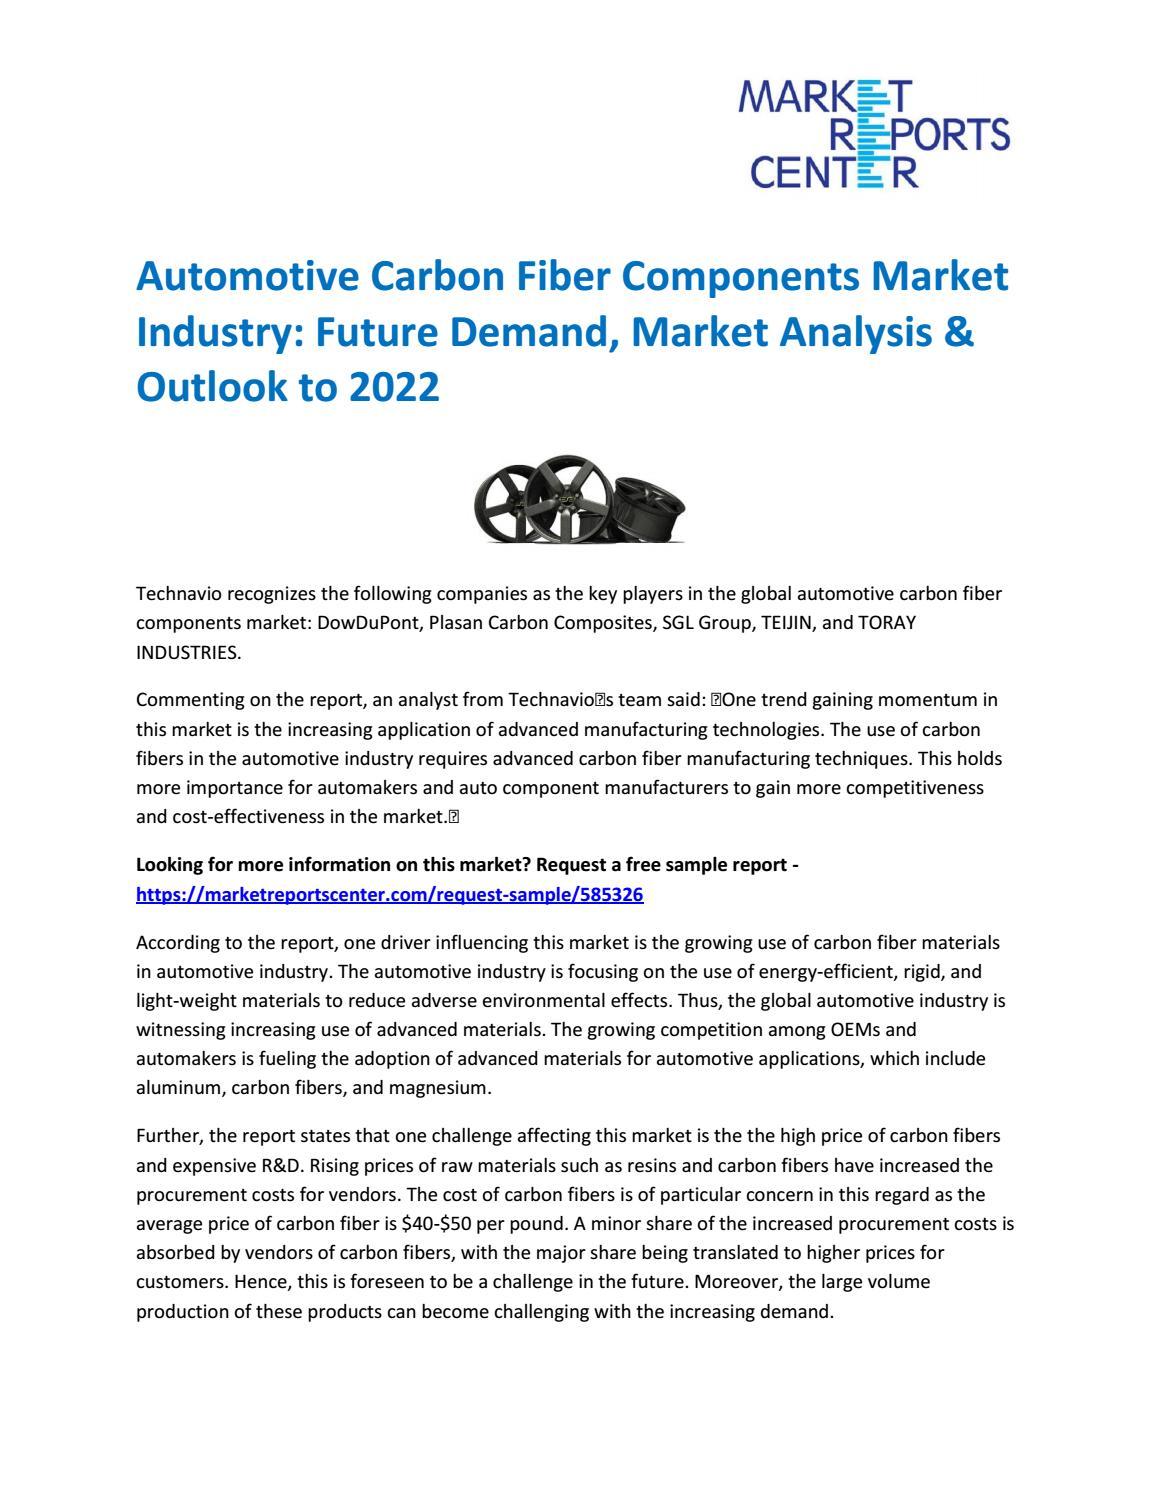 Automotive Carbon Fiber Components Market Industry: Future Demand